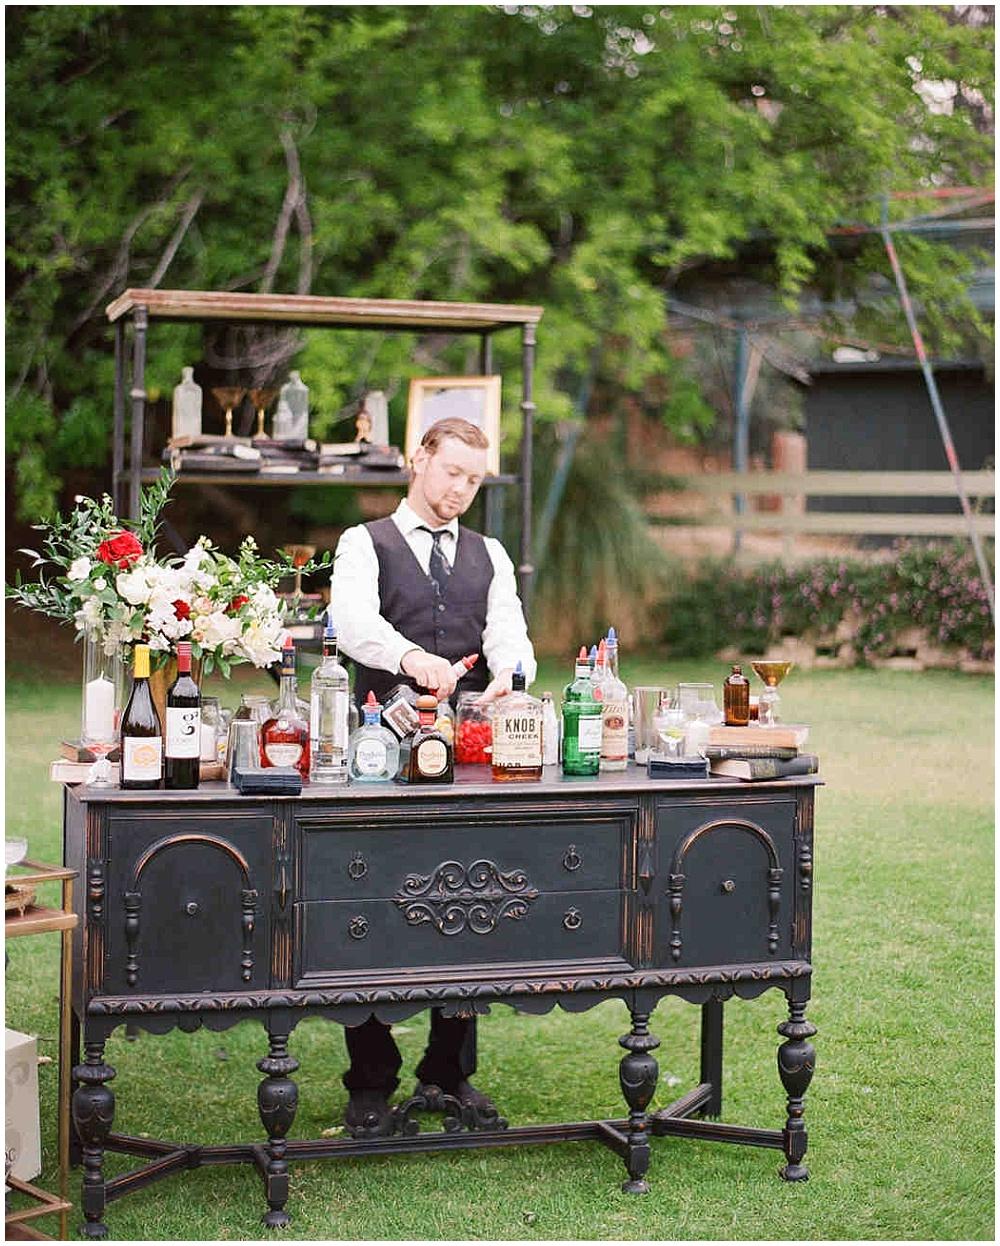 7 Waysto Make Your Wedding Interactive   interactive wedding; wedding ideas; whiskey bar; whiskey station; whiskey tasting; whiskey tasting room; wedding whiskey station